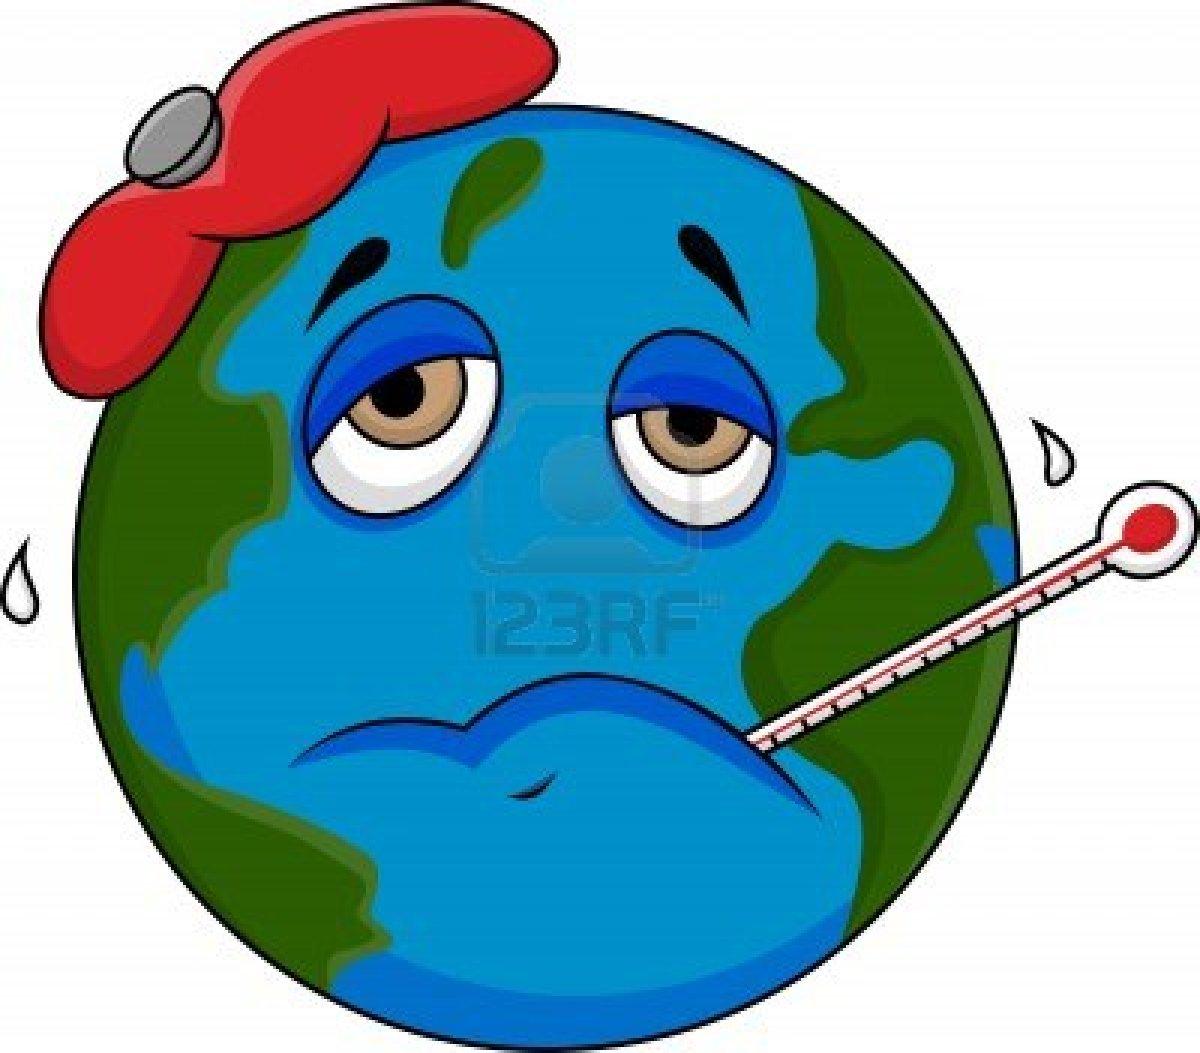 sick planet earth - photo #2